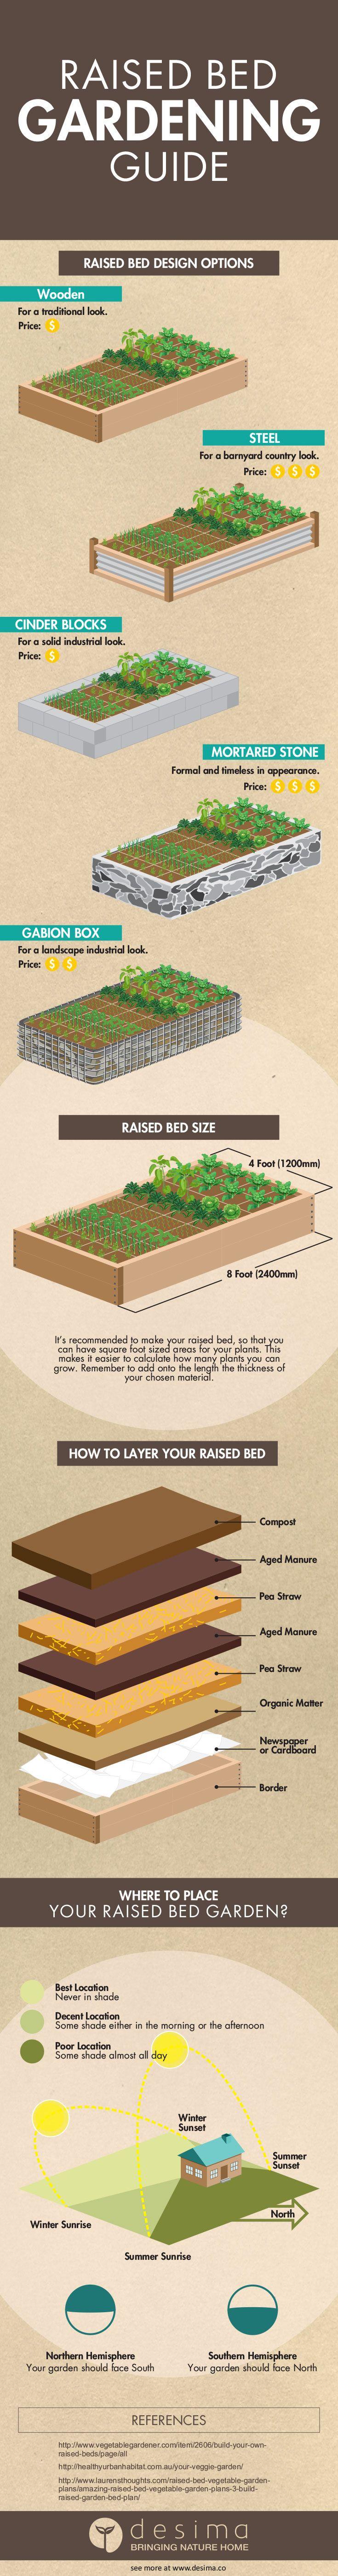 Best 20 Raised Beds Ideas On Pinterest Garden Beds Raised Garden Beds And Building Raised